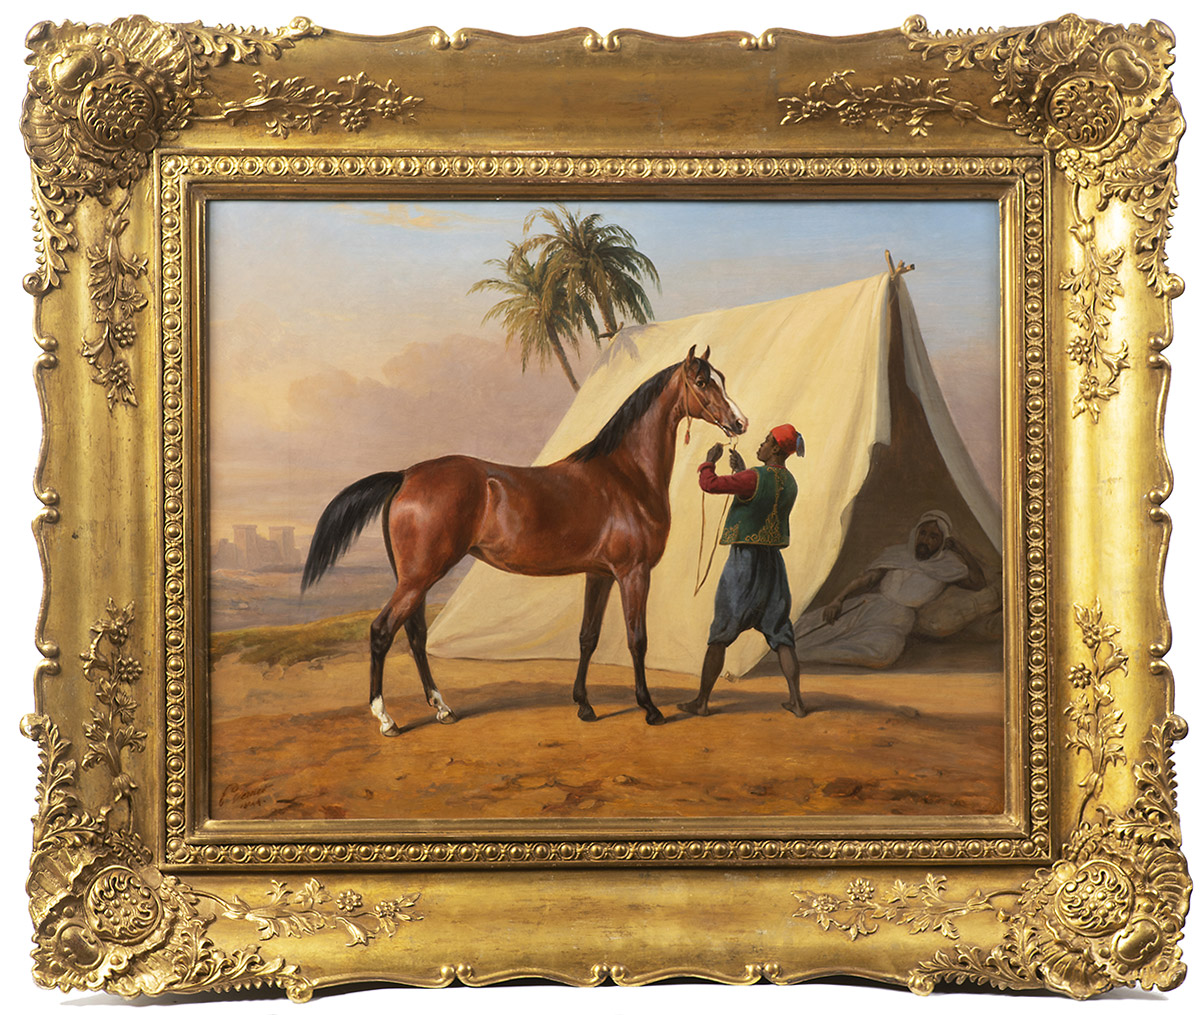 arthouse-hejtmanek-predvadeni-arabskeho-kone-vernet